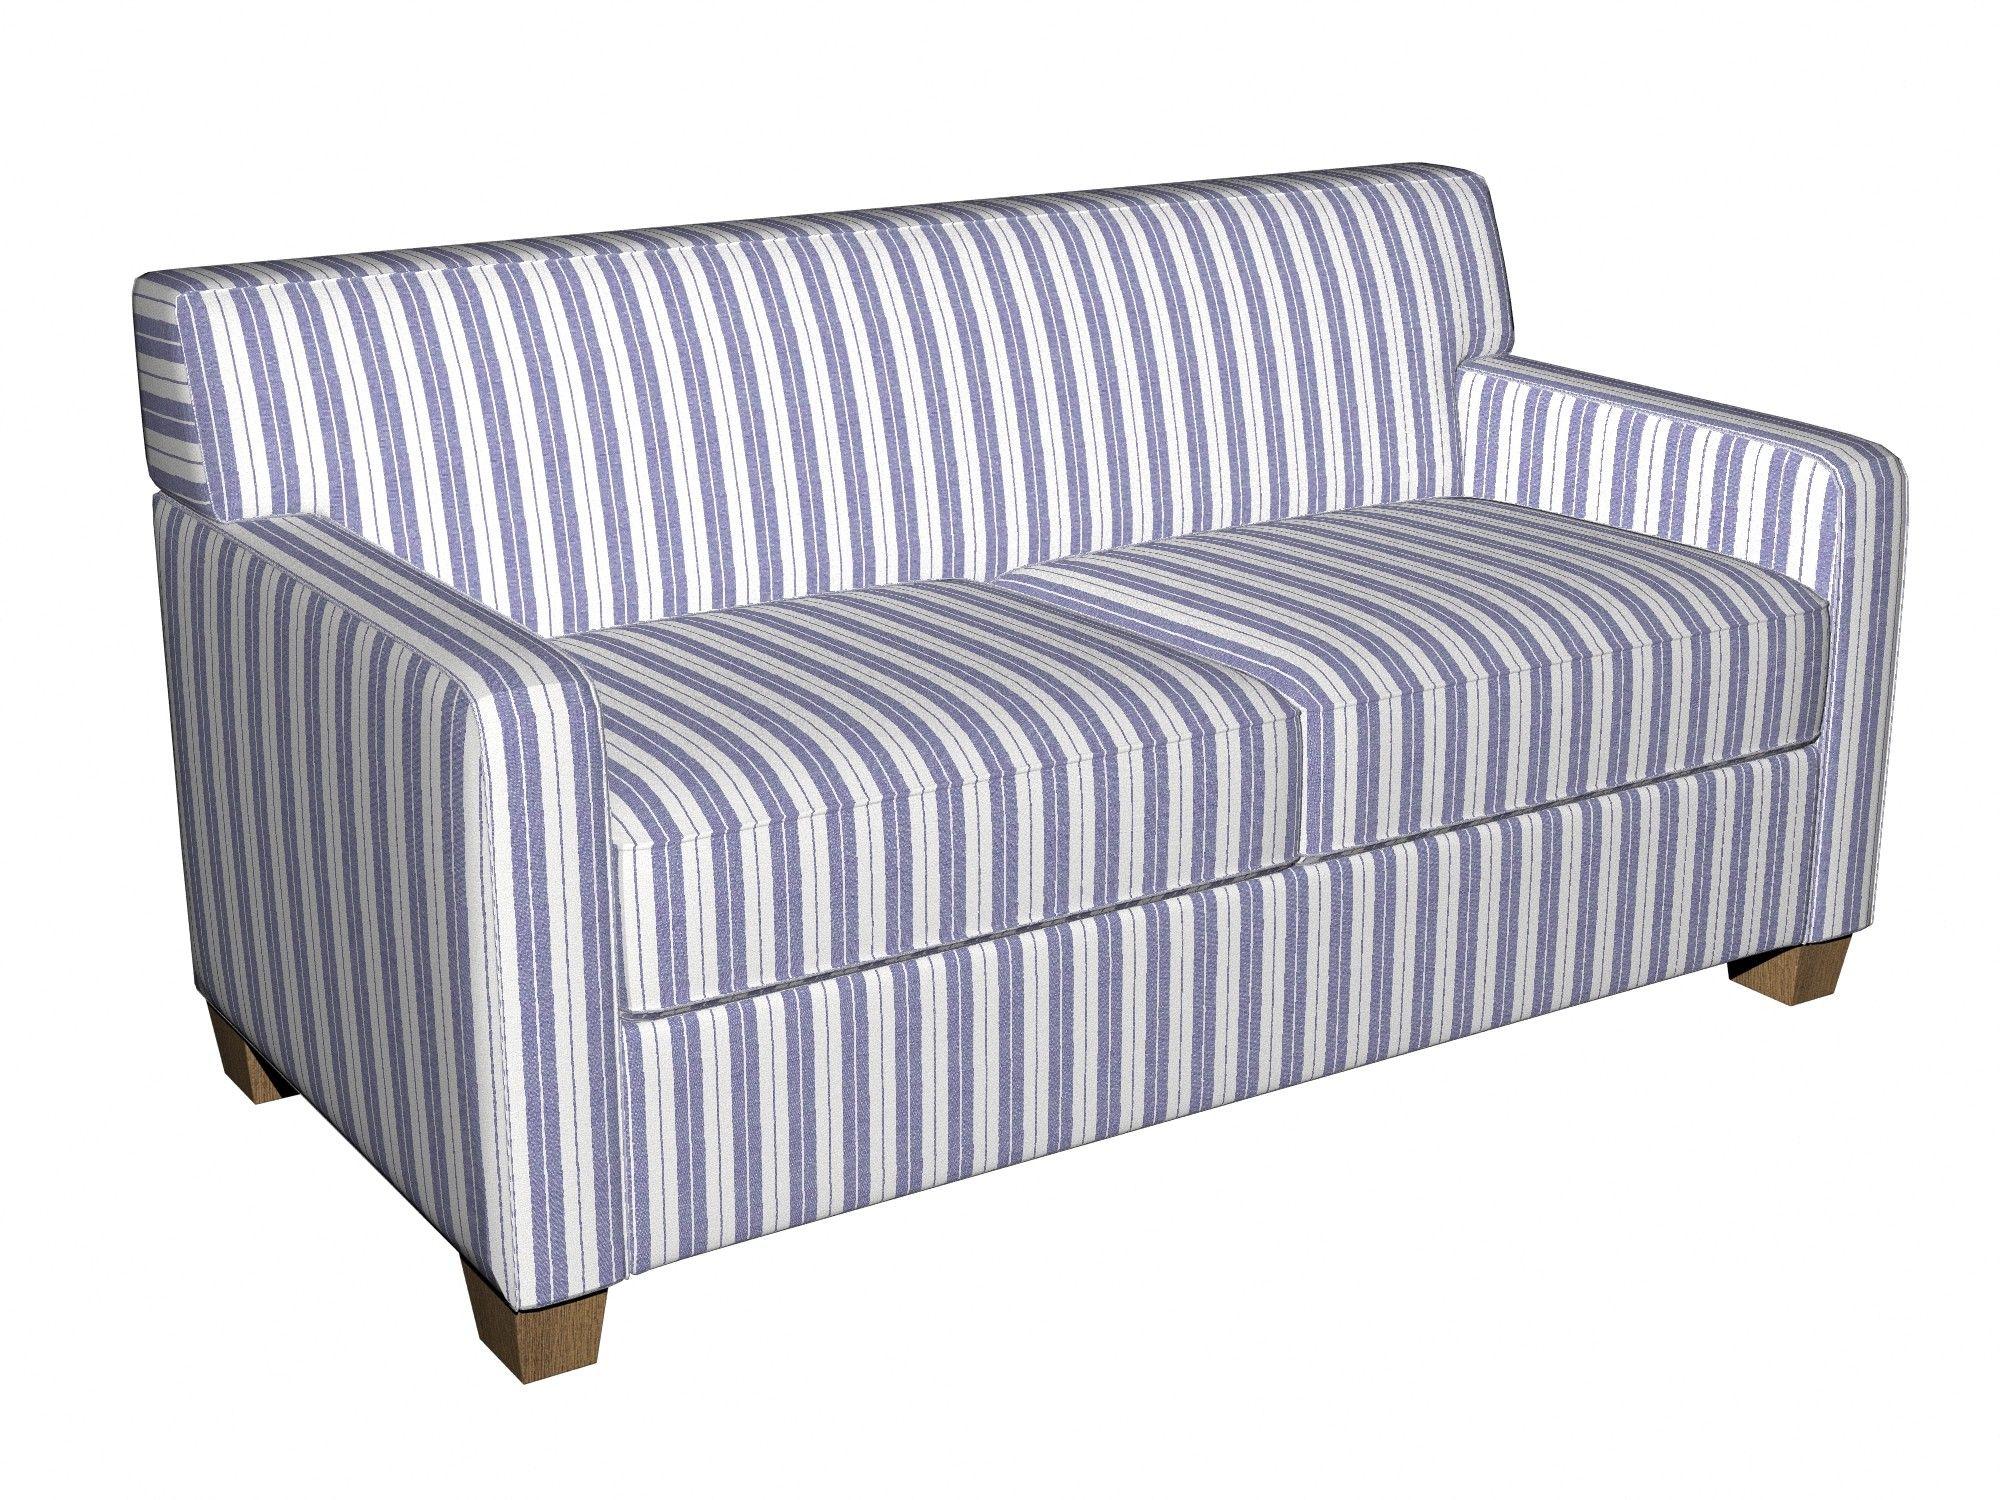 Blue And White Striped Sofa Bed Shapeyourminds Com